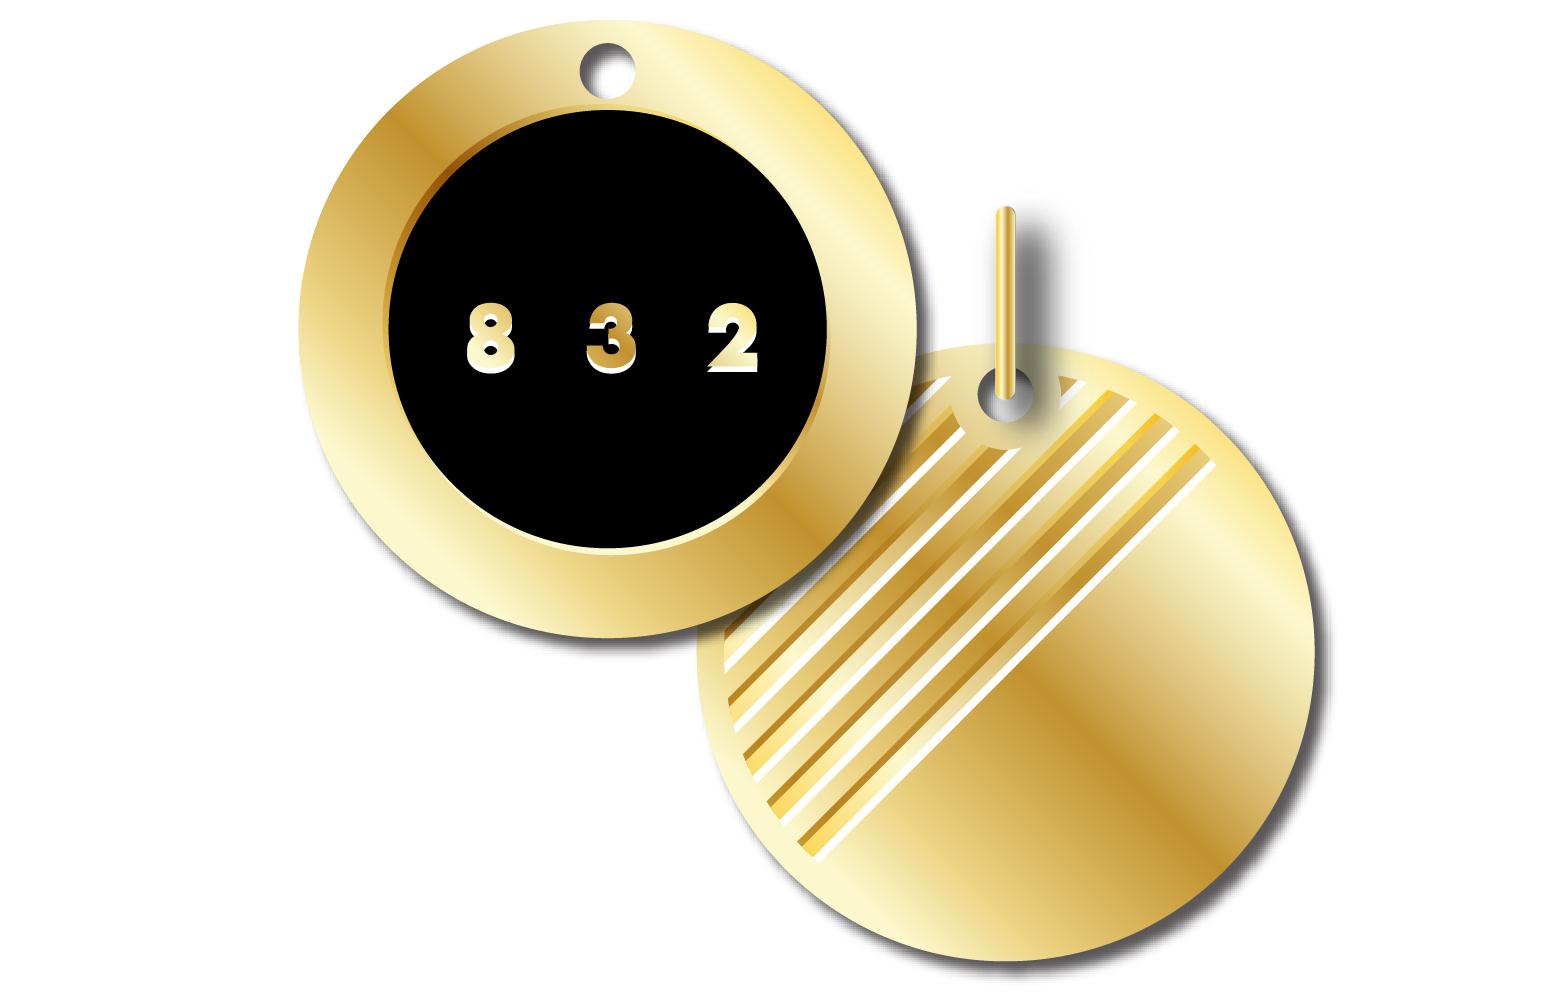 5fc7b5eb3252f.jpg